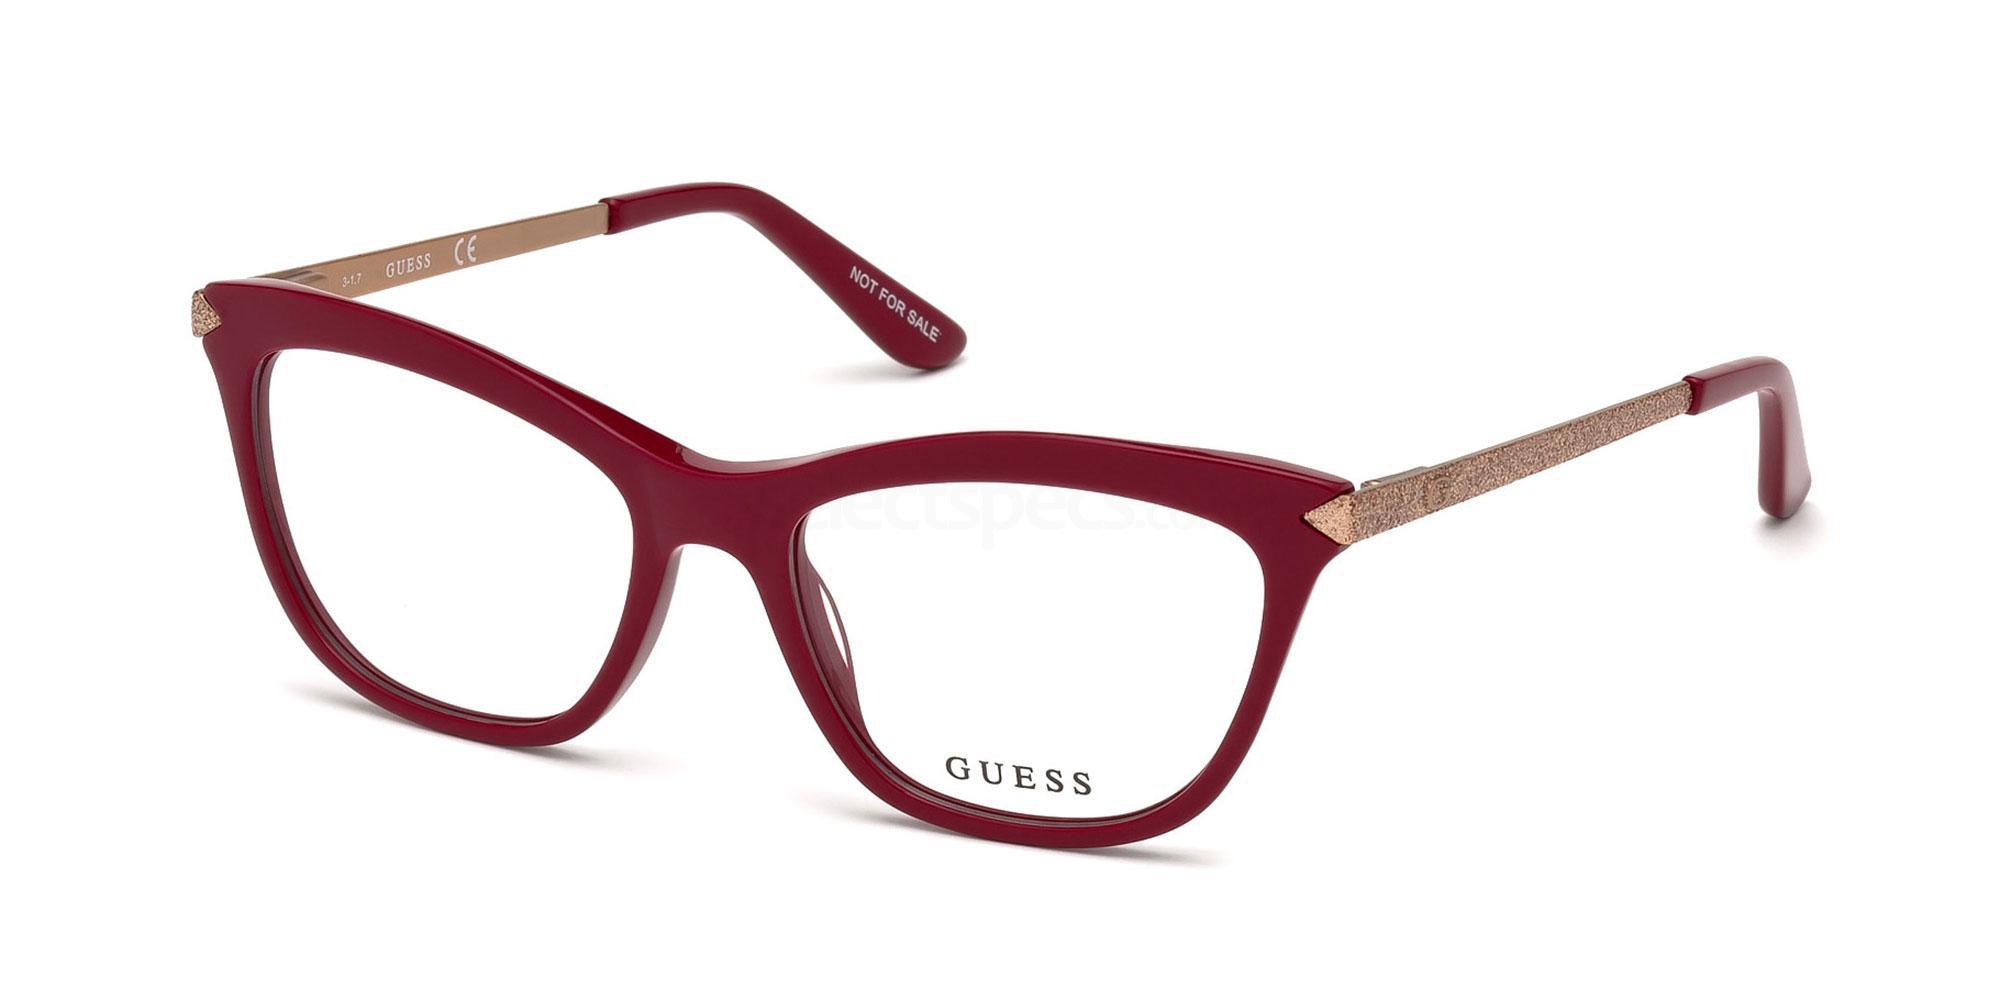 072 GU2655 Glasses, Guess